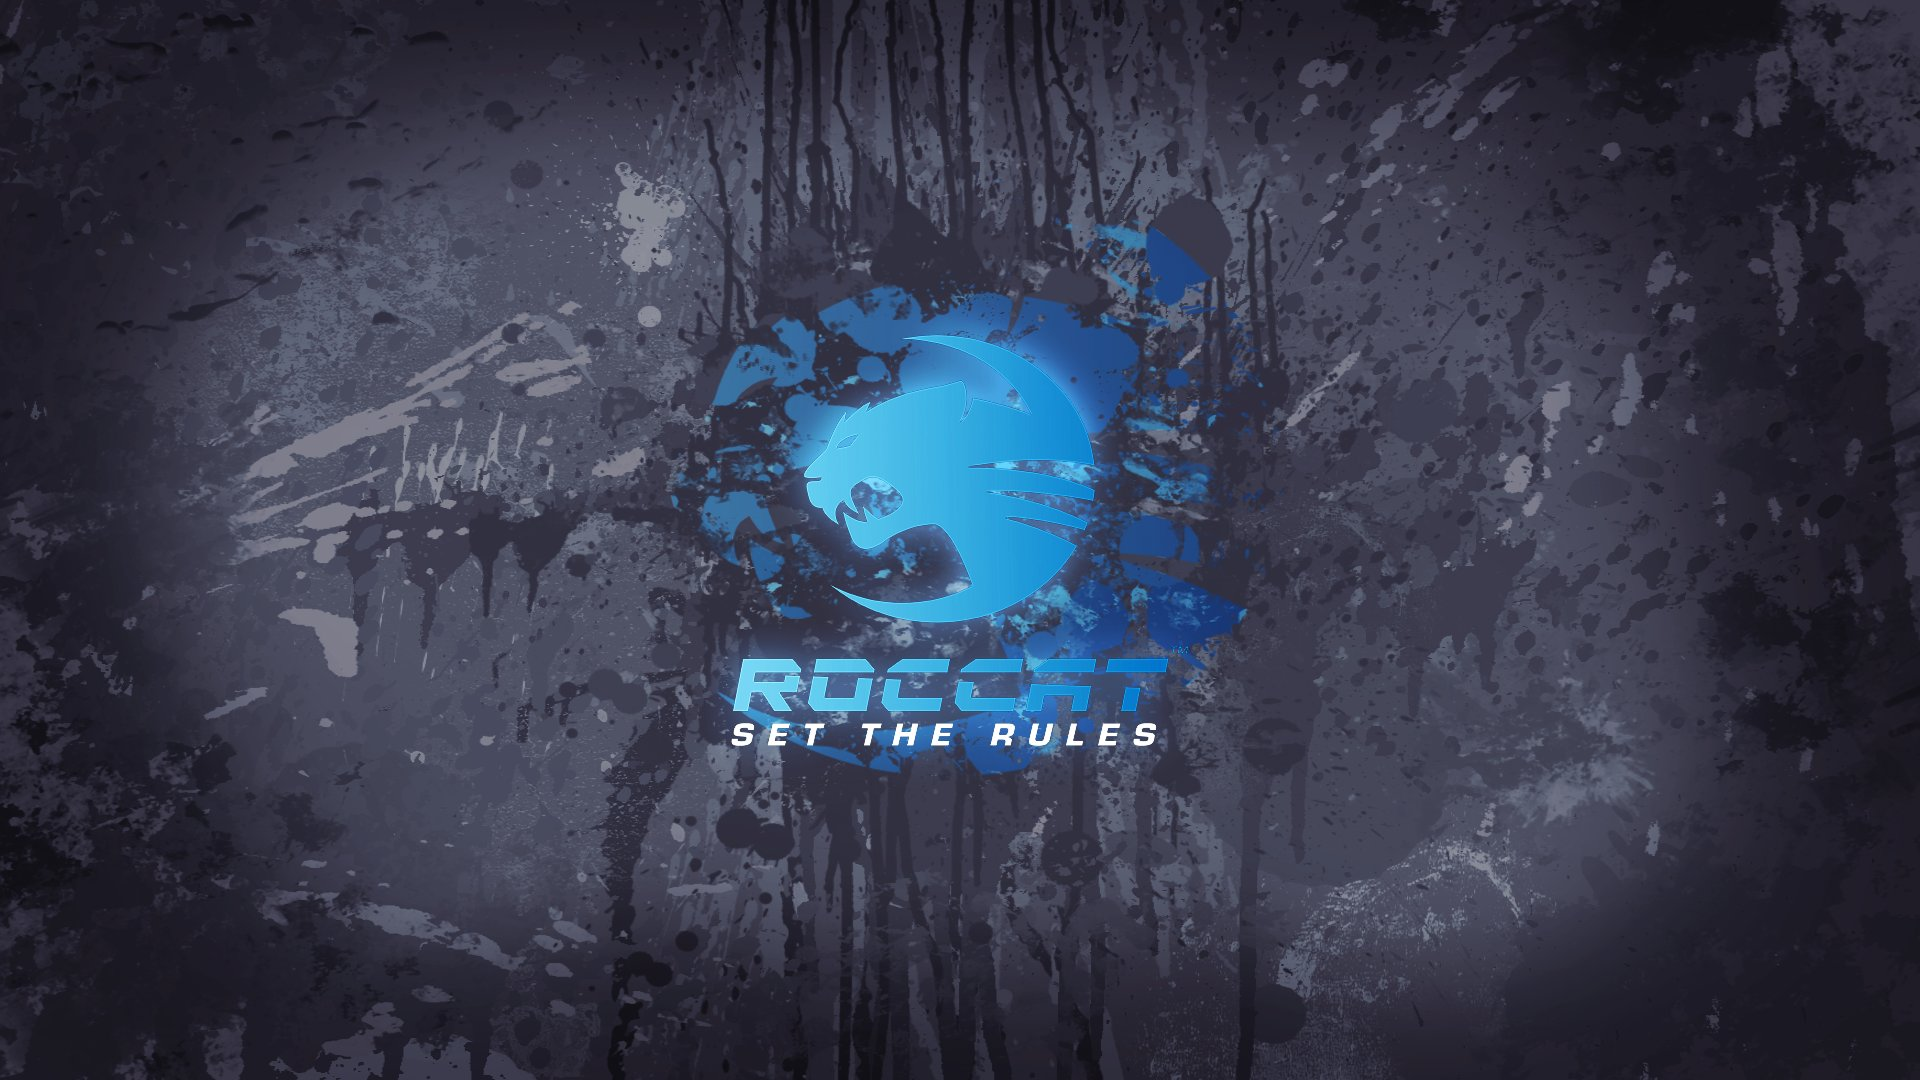 Roccat - Set the rules - Custom Wallpaper FULL HD by GazhKha on ...